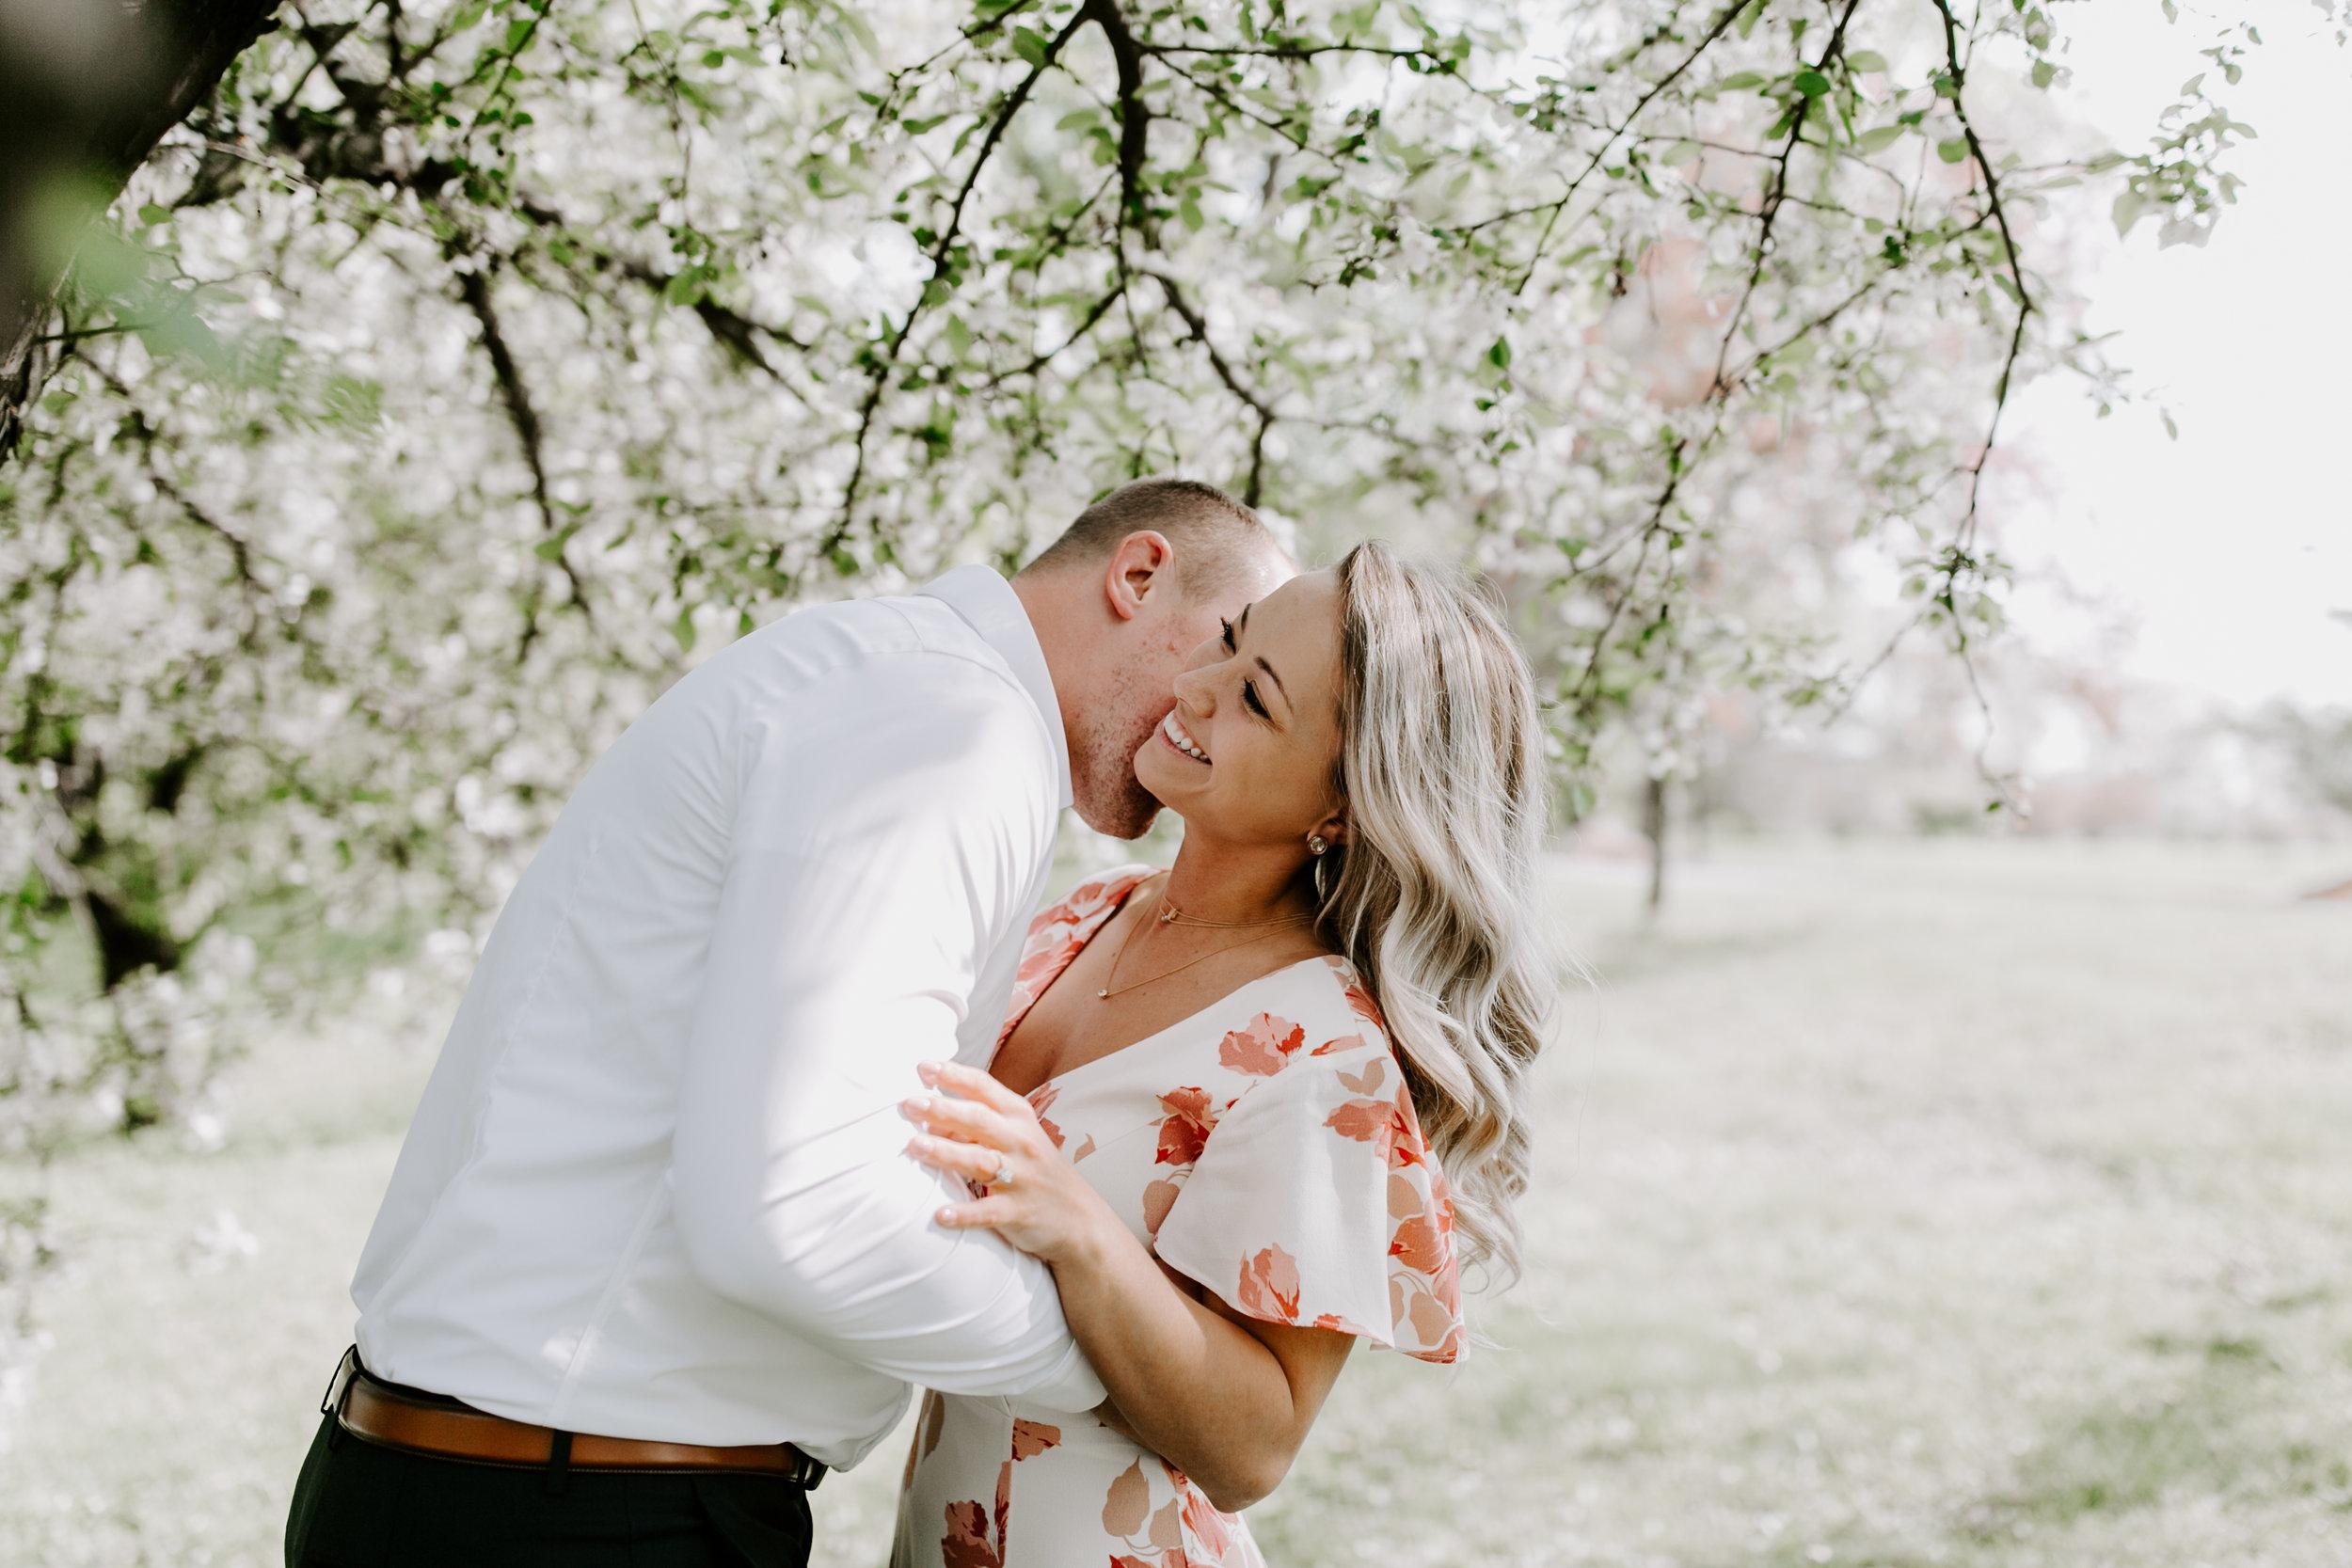 gracetphotography-wedding-photographer-adventure-bride-engagement-midwest-2.jpg